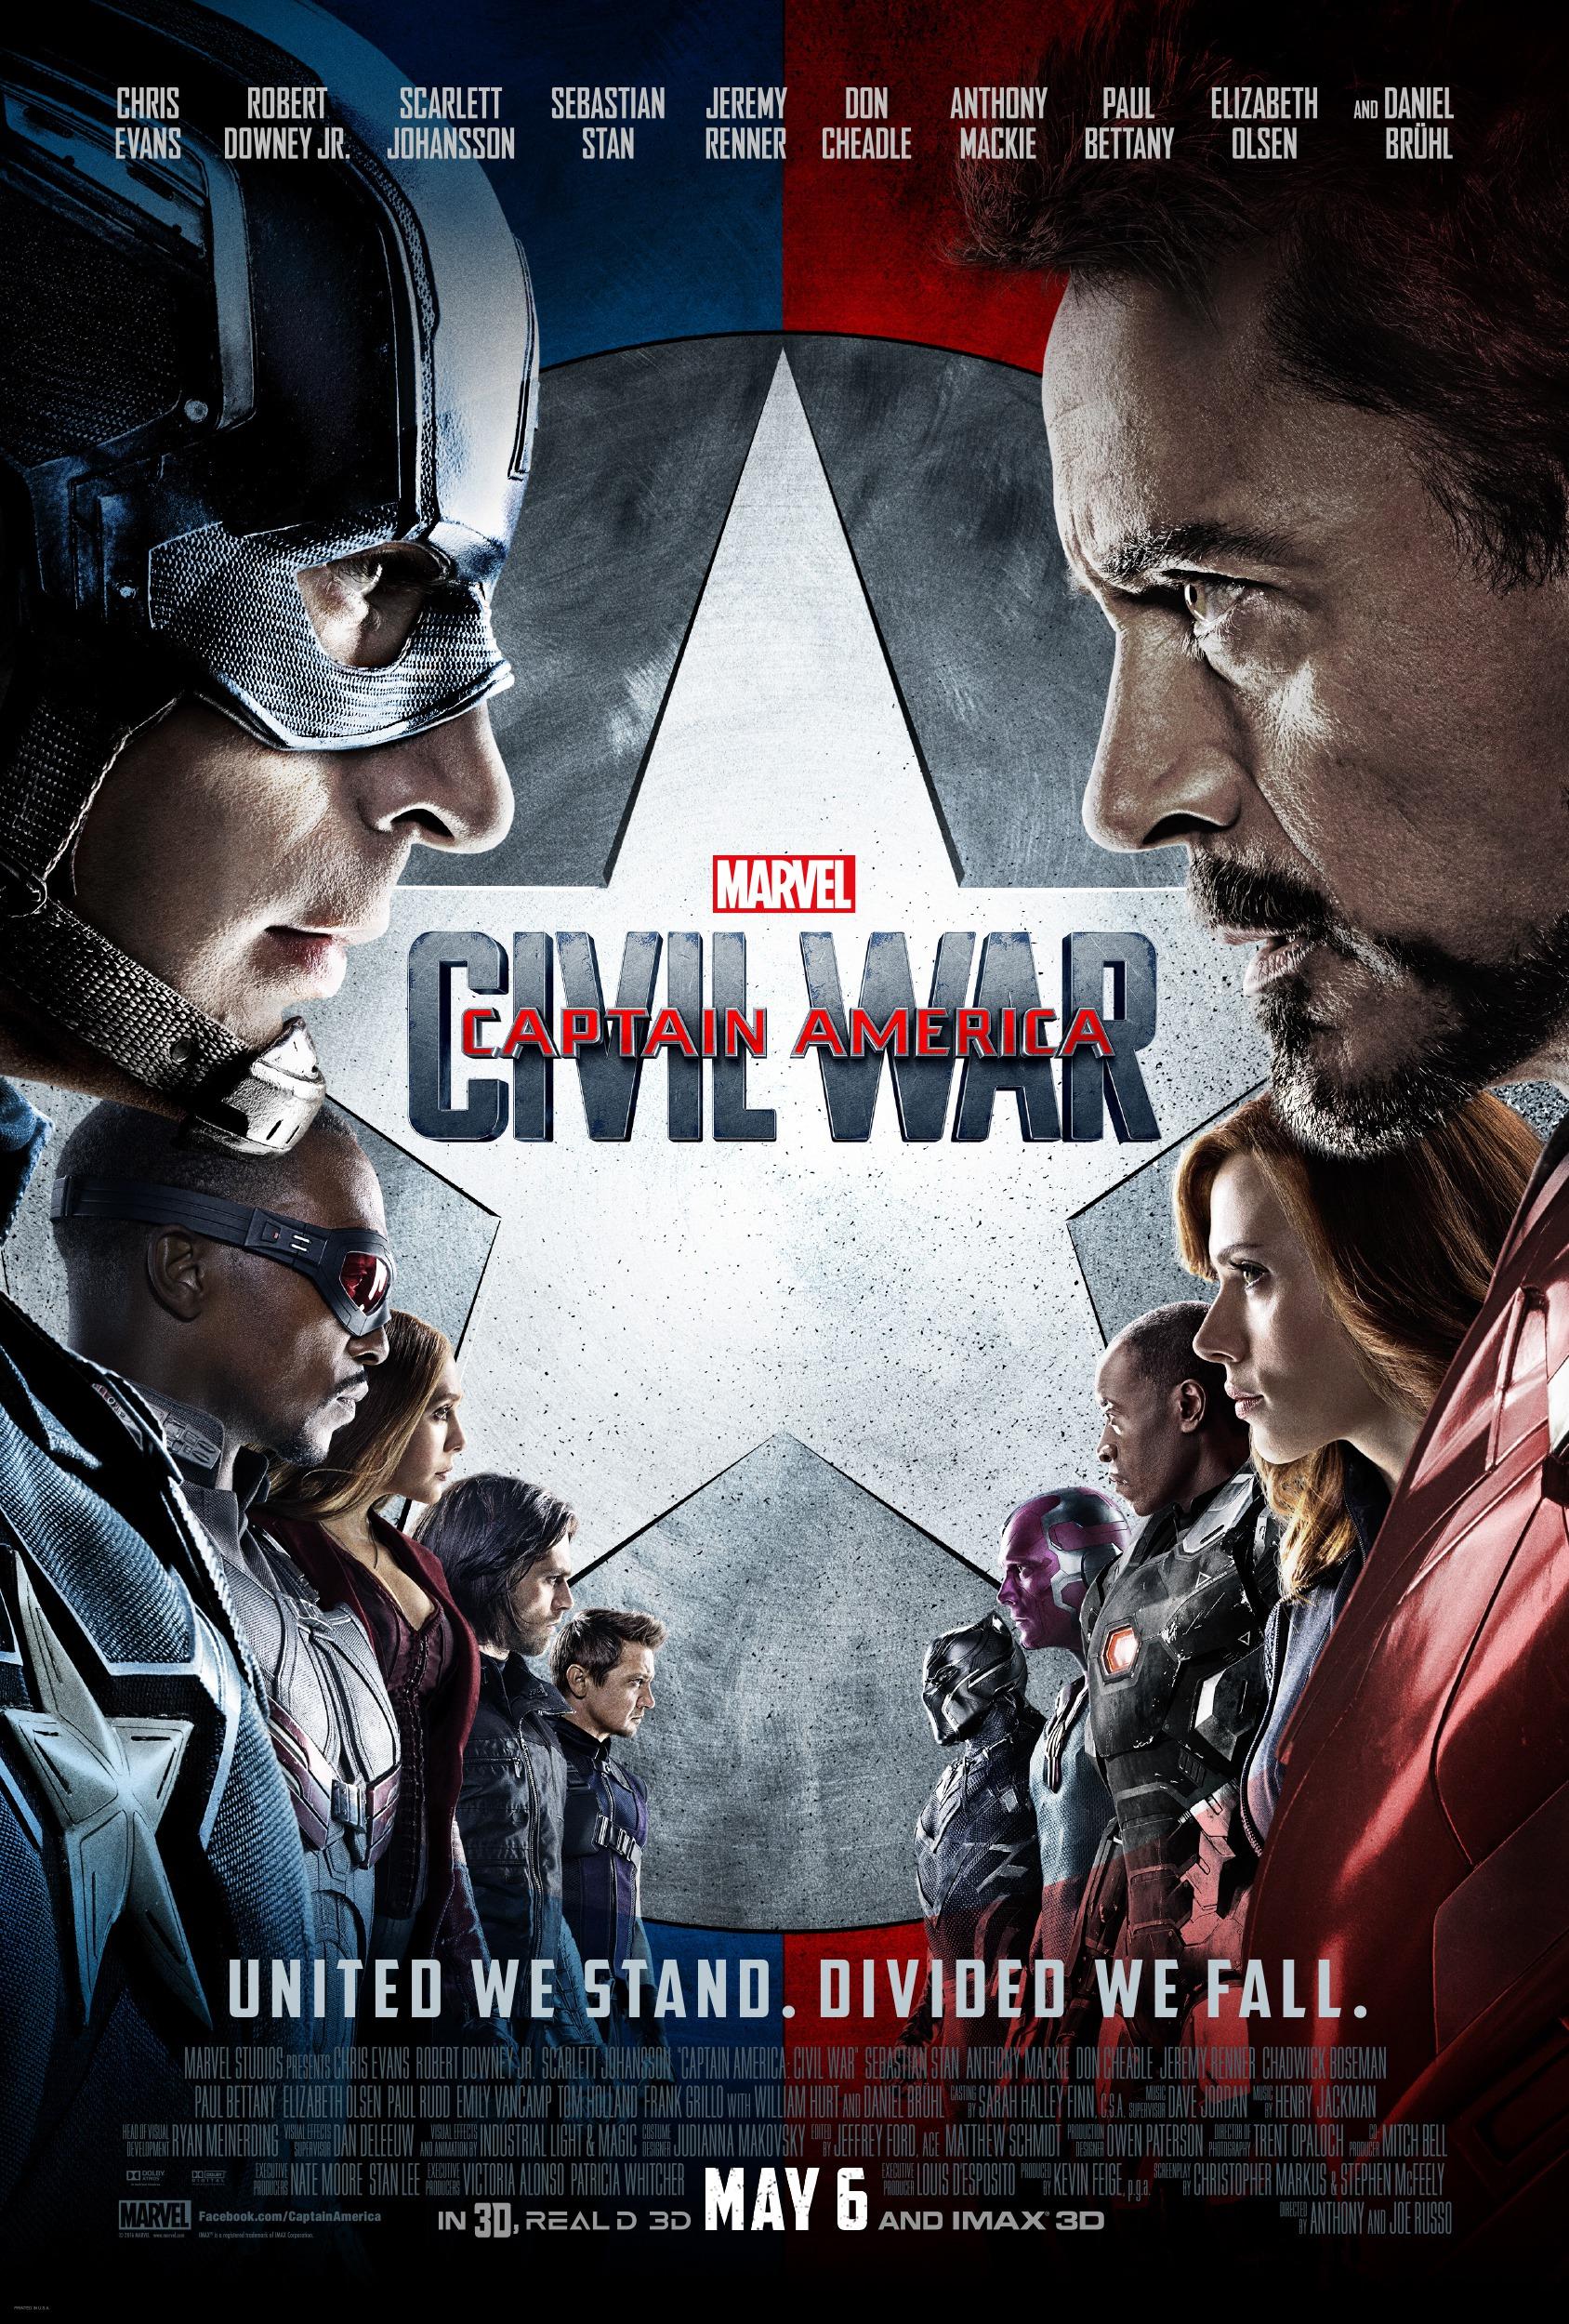 955c243b85155 Captain America: Civil War | Transcripts Wiki | FANDOM powered by Wikia